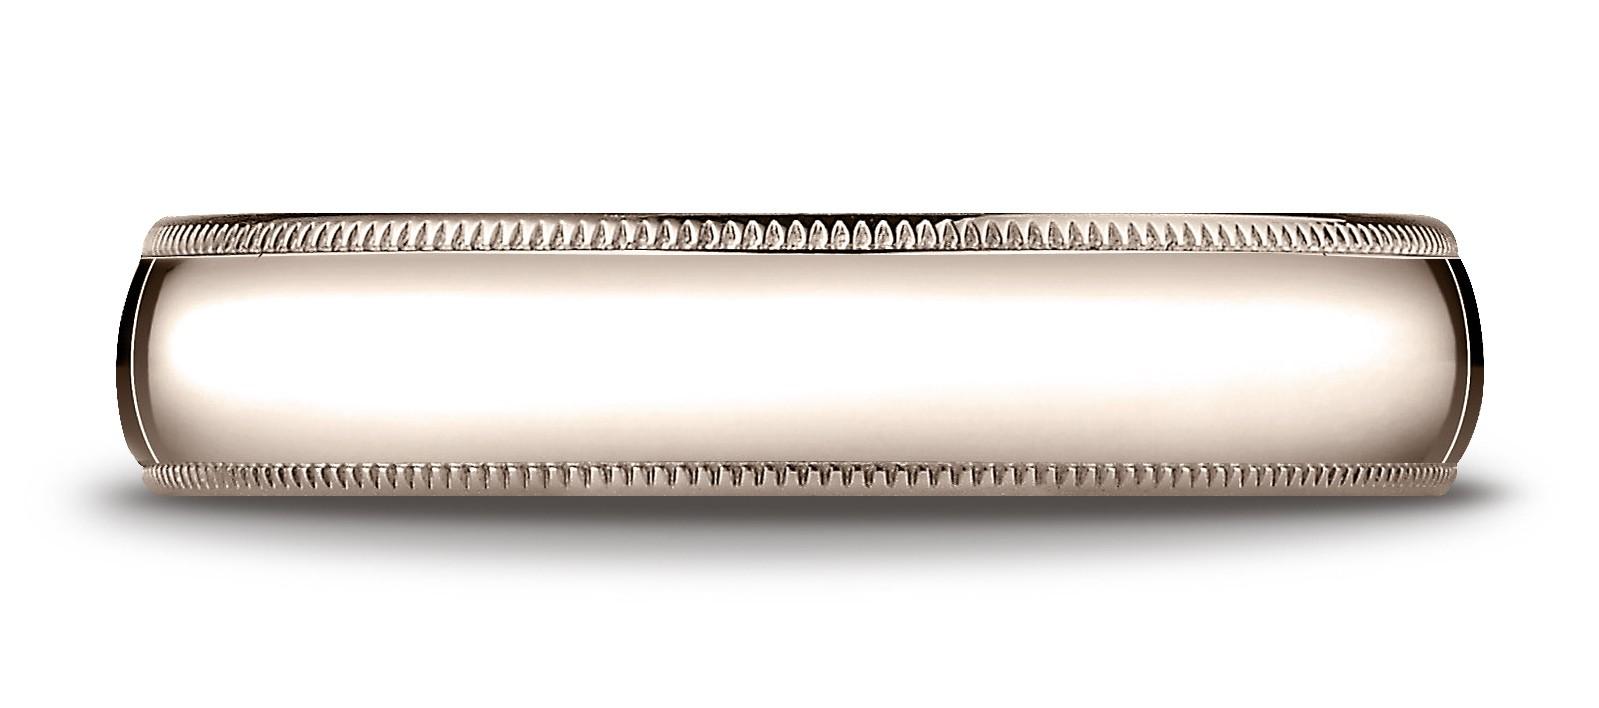 14k Rose Gold 5mm Slightly Domed Standard Comfort-fit Ring With Milgrain